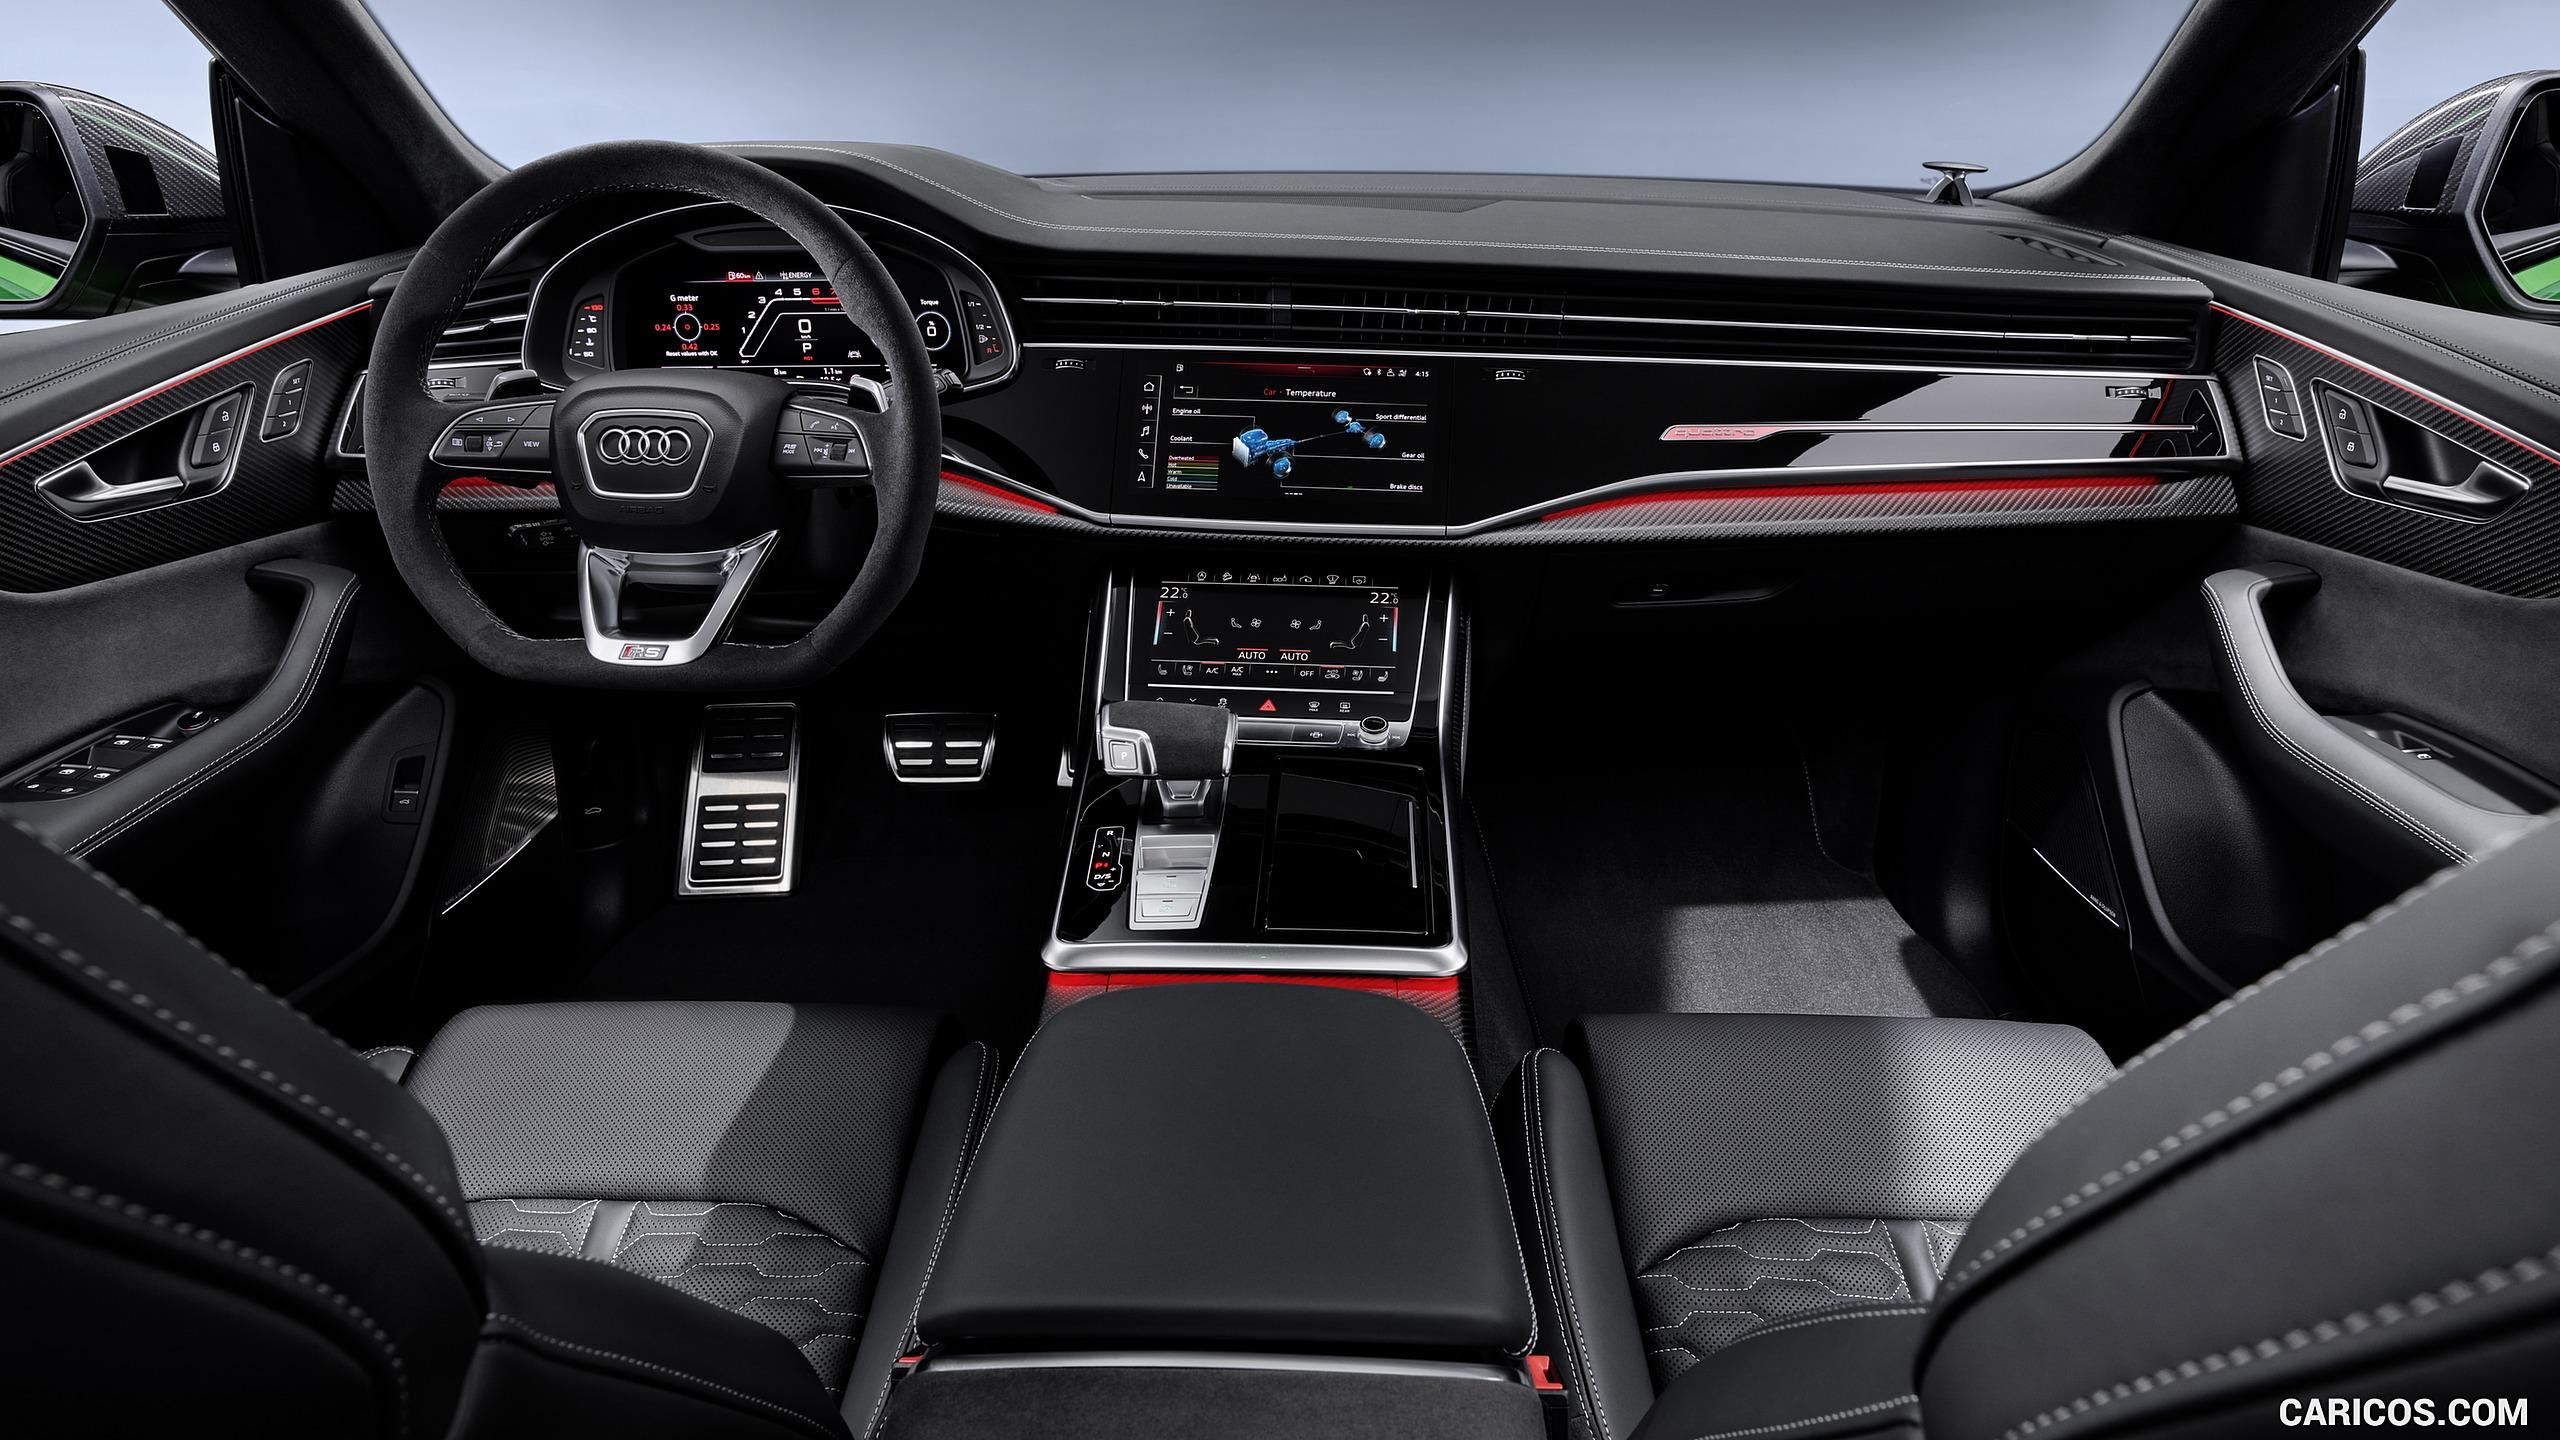 Free Download 2020 Audi Rs Q8 Interior Cockpit Hd Wallpaper 13 2560x1440 For Your Desktop Mobile Tablet Explore 41 Audi Rs Q8 2020 Wallpapers Audi Rs Q8 2020 Wallpapers Audi rs q8 2020 4k interior wallpaper